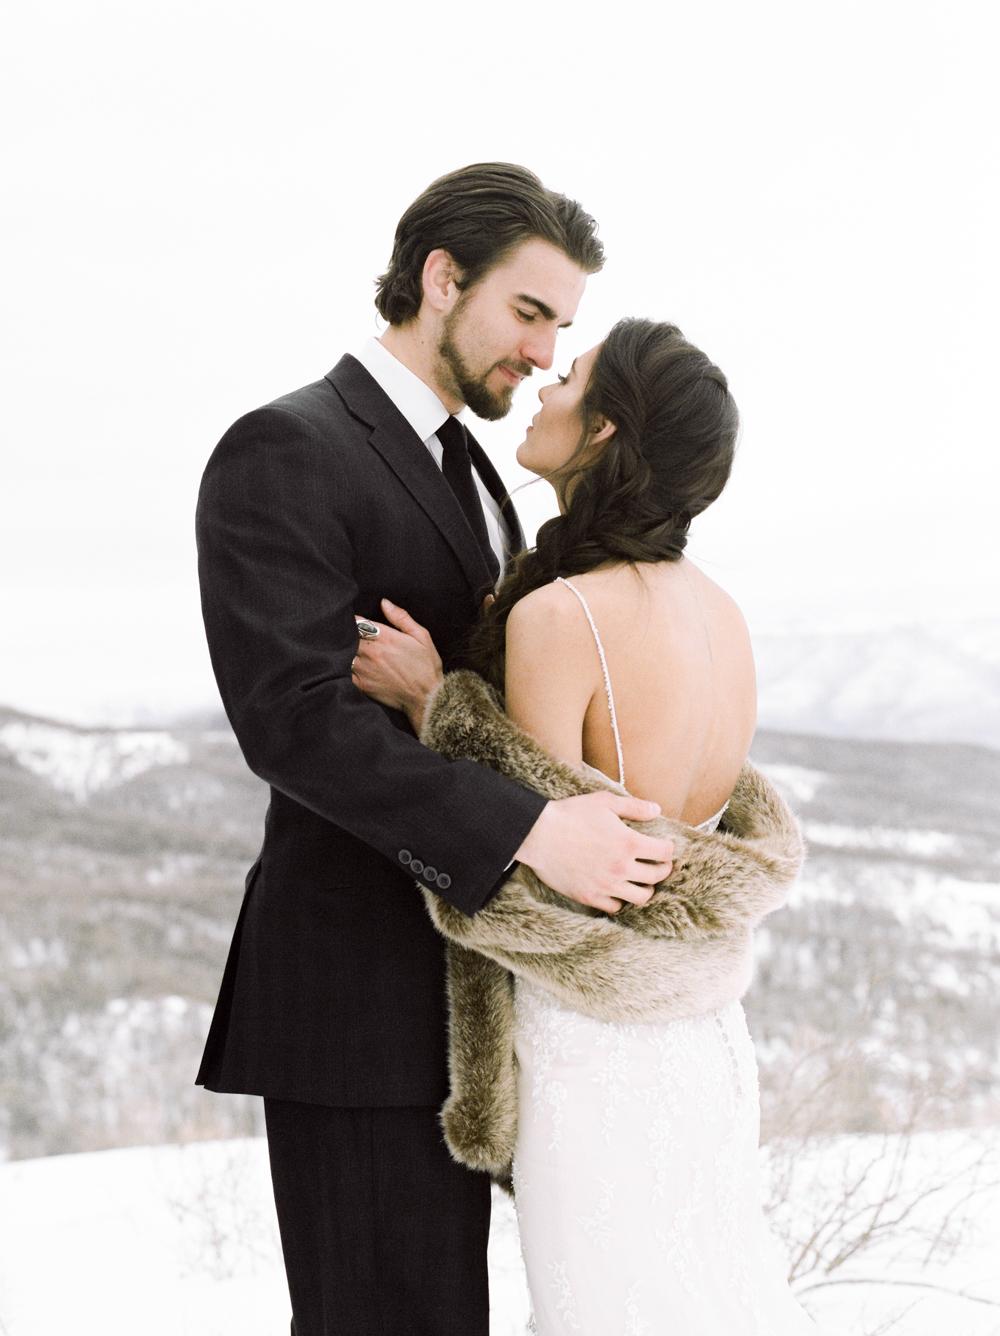 Christine-Gosch-Utah-film-photographer-wedding-mountains-snow-snowy-destination-10.jpg